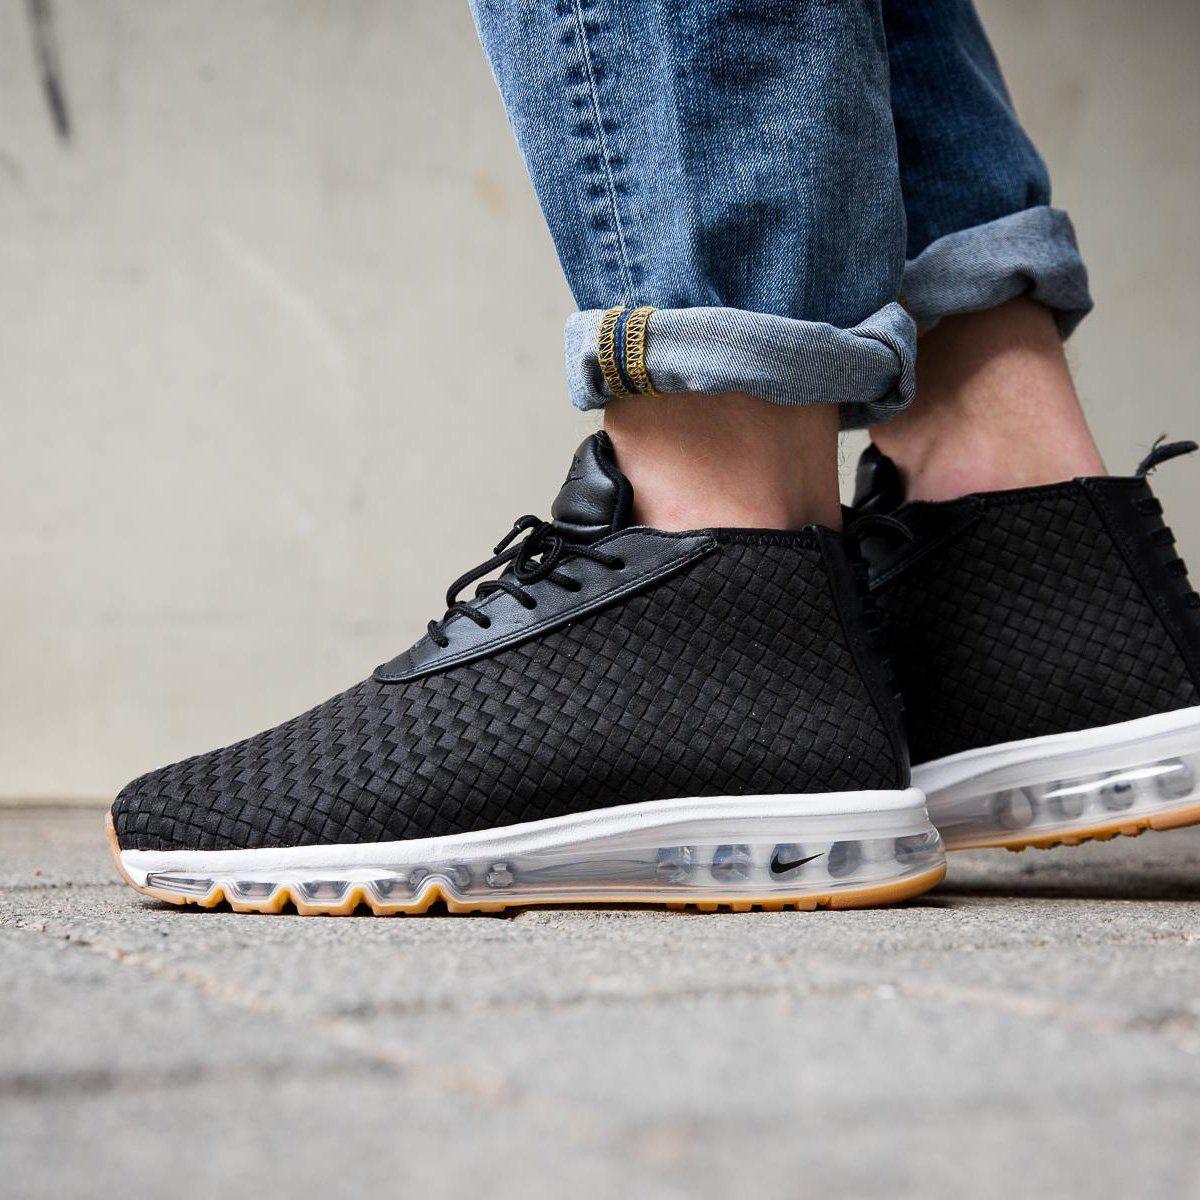 15b78ceb4f86 Nike Air Max Woven Boot